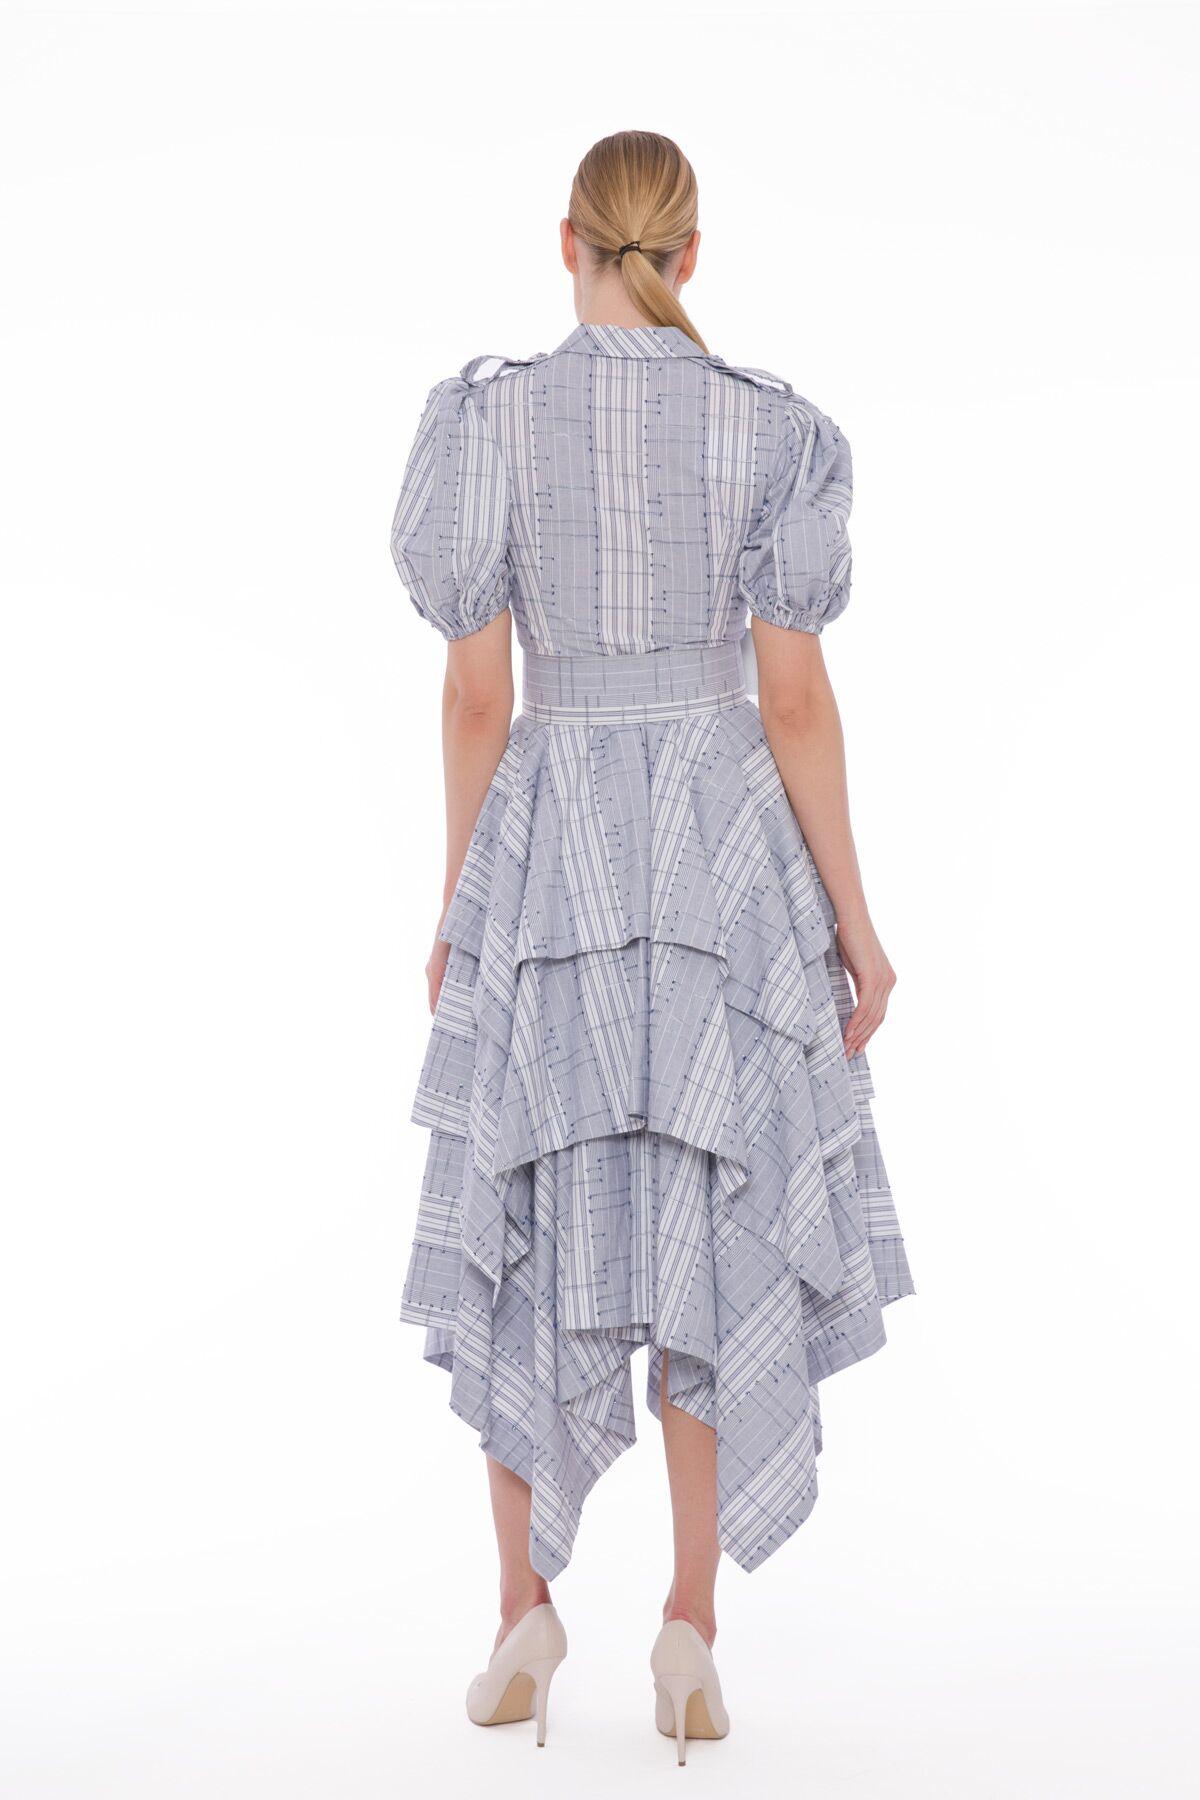 Etek Ucu Mendil Kesim, İşleme Detaylı Midi Boy Elbise